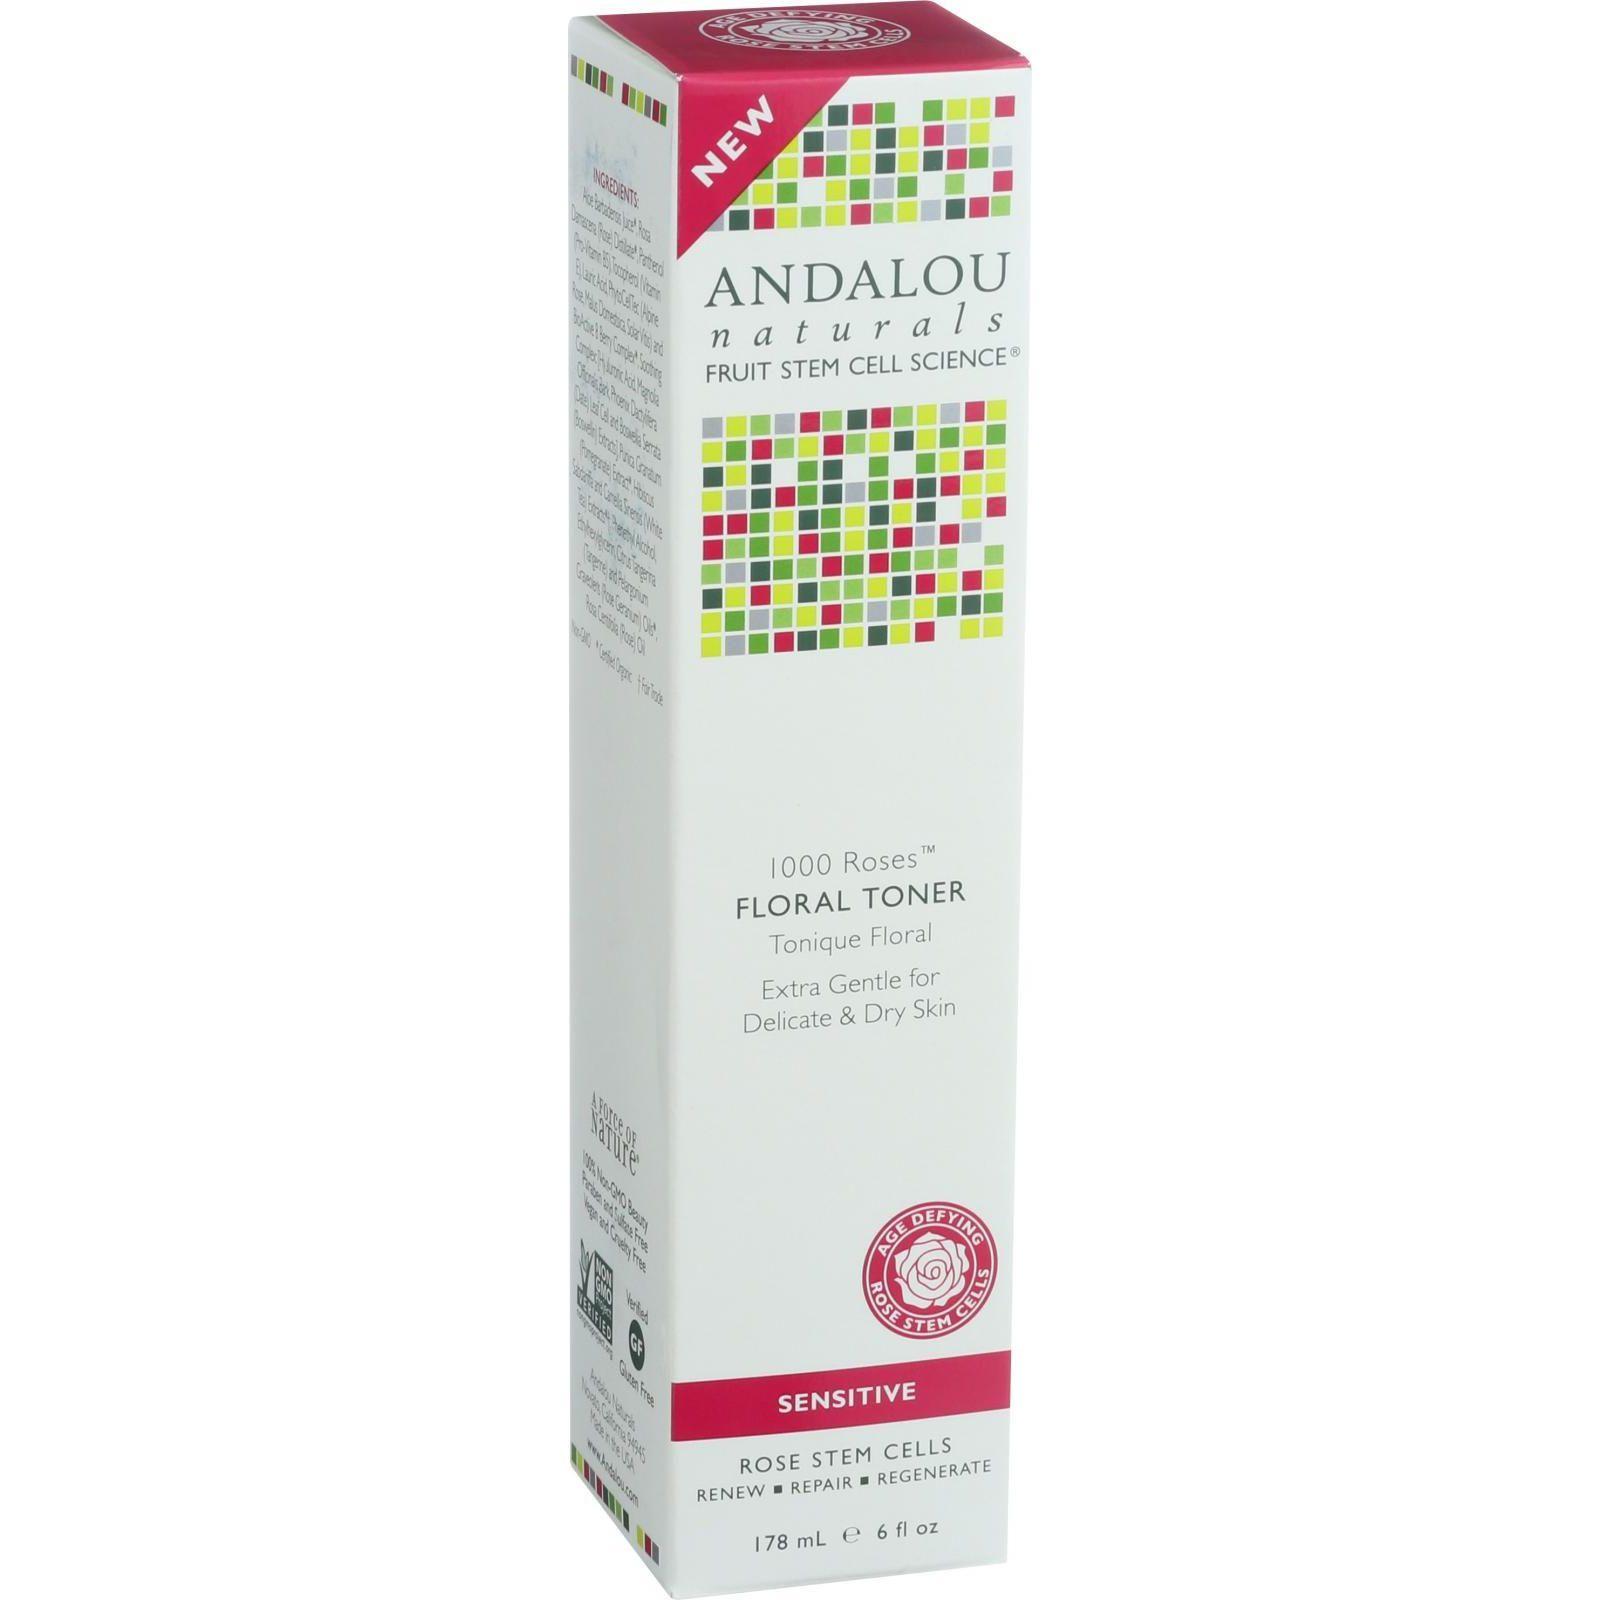 Andalou Naturals Floral Toner  1000 Roses  6 oz